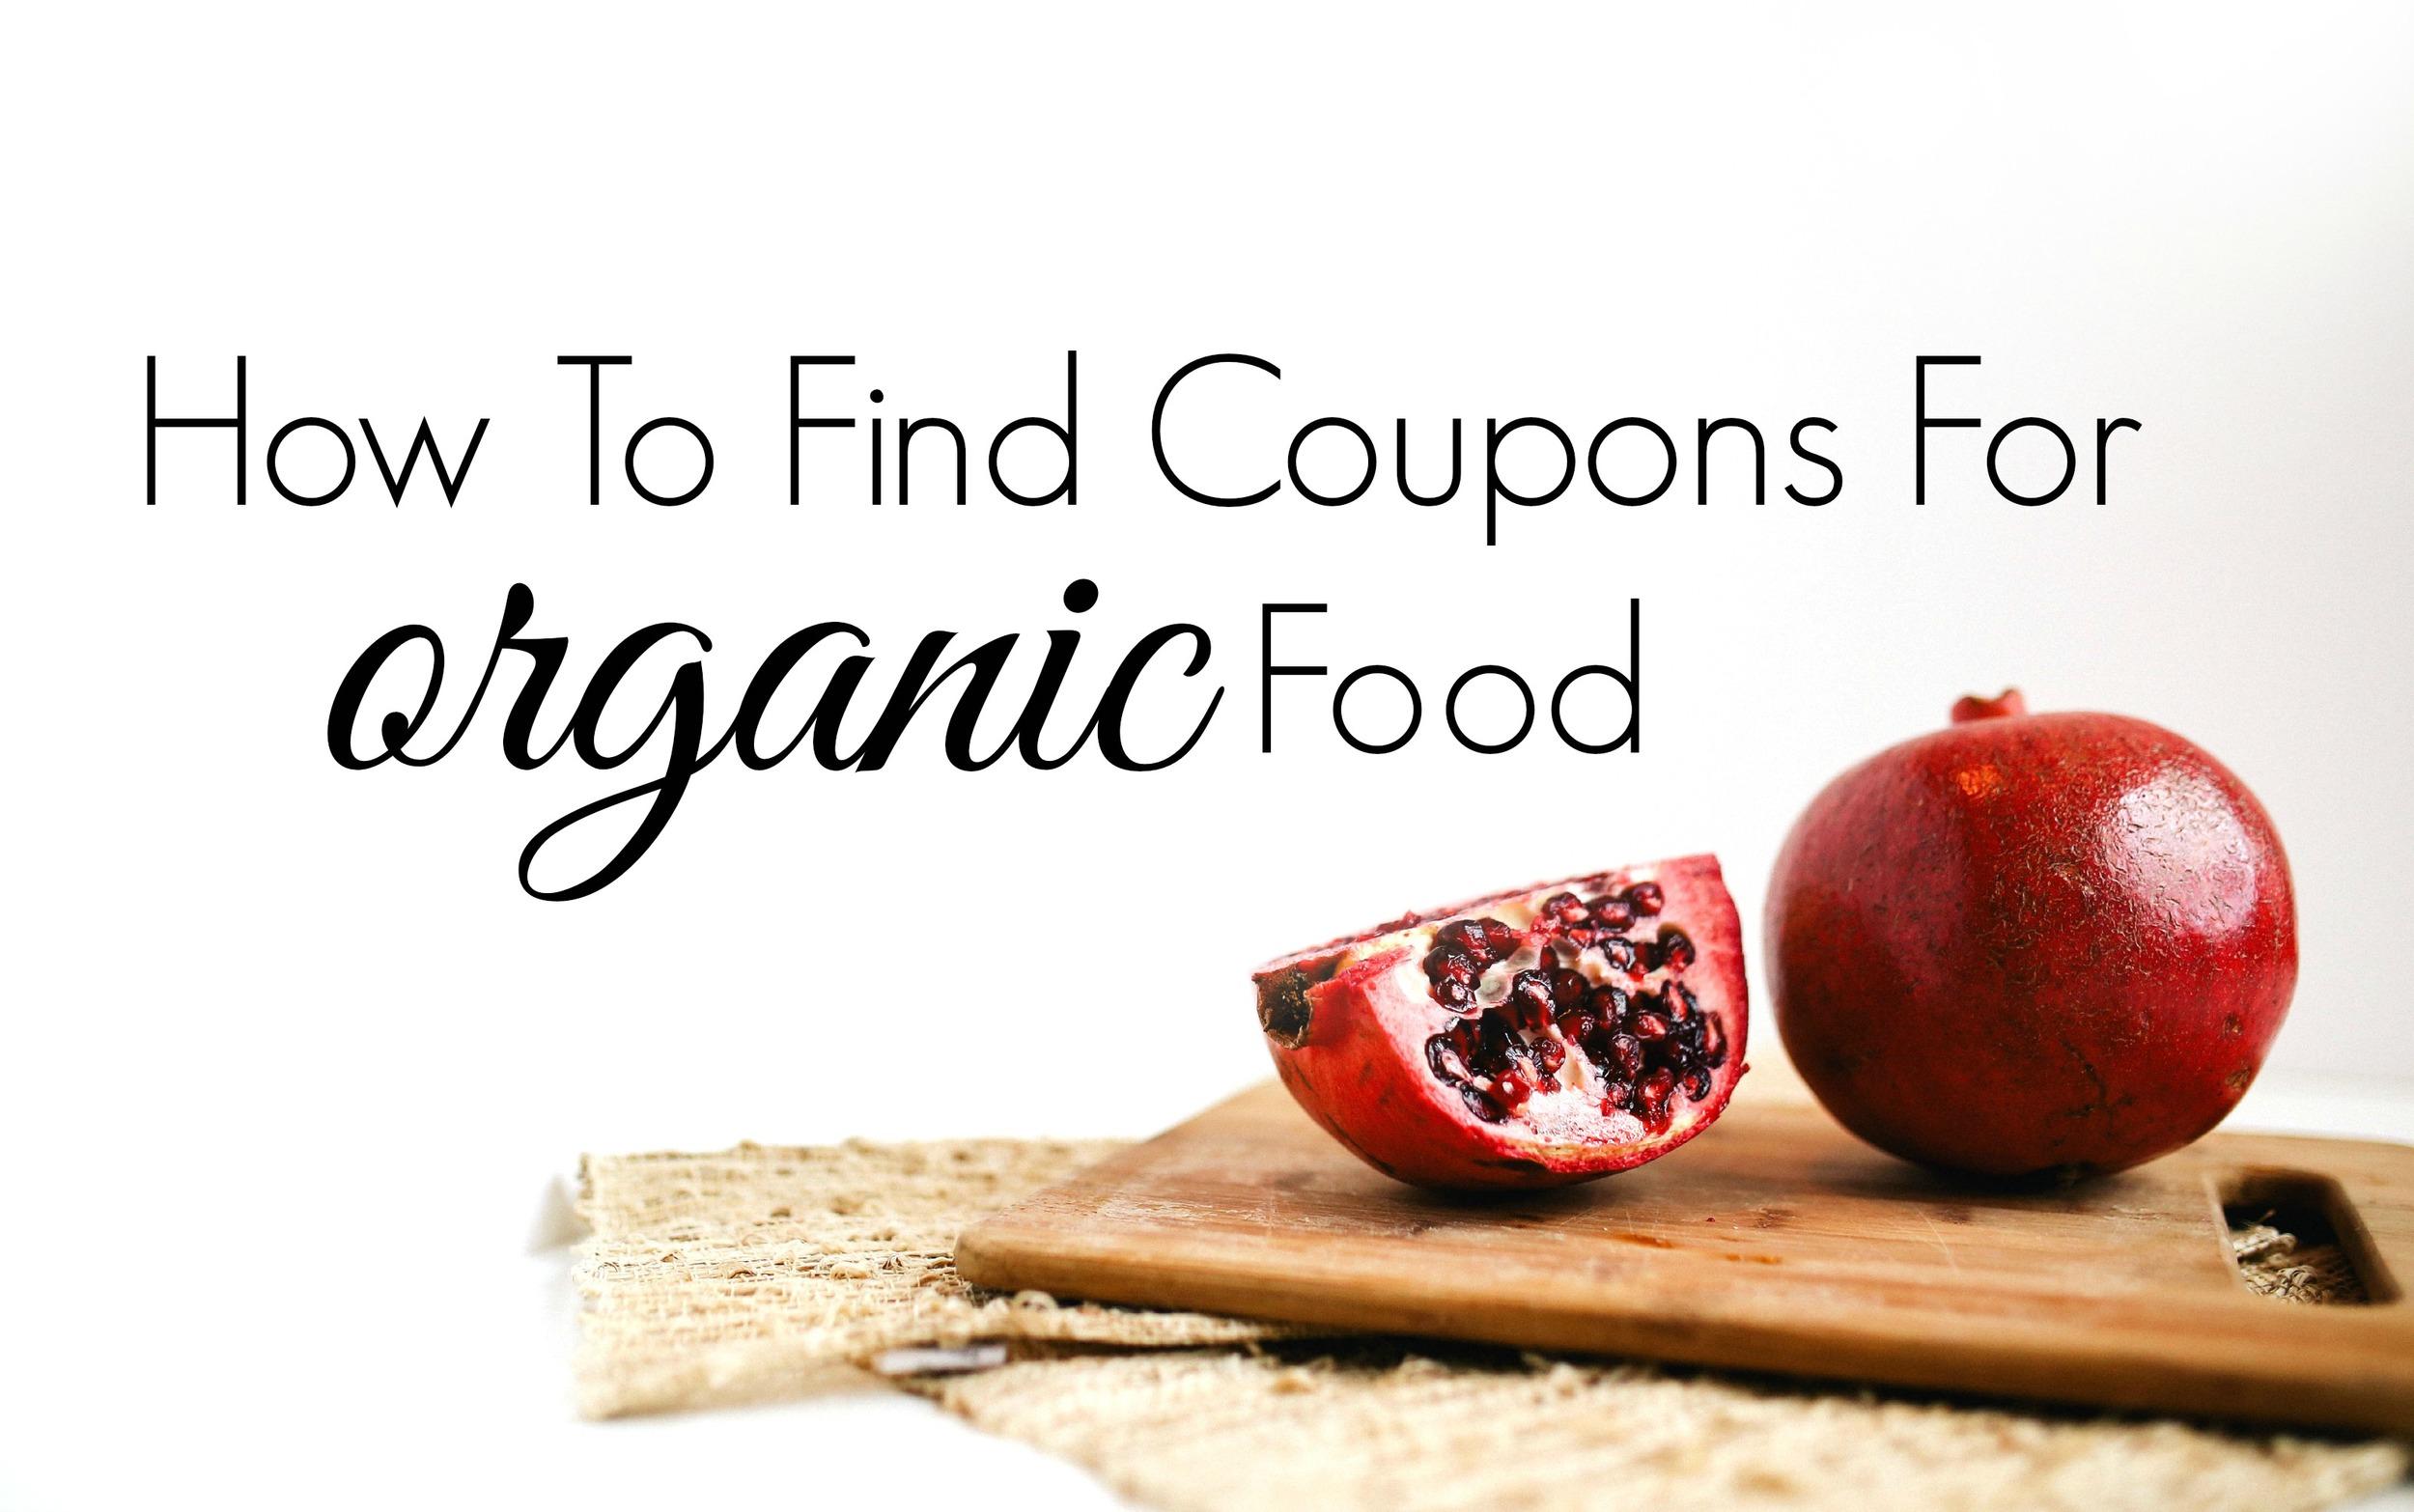 (even fresh produce like pomegranates can be coupon'ed!)